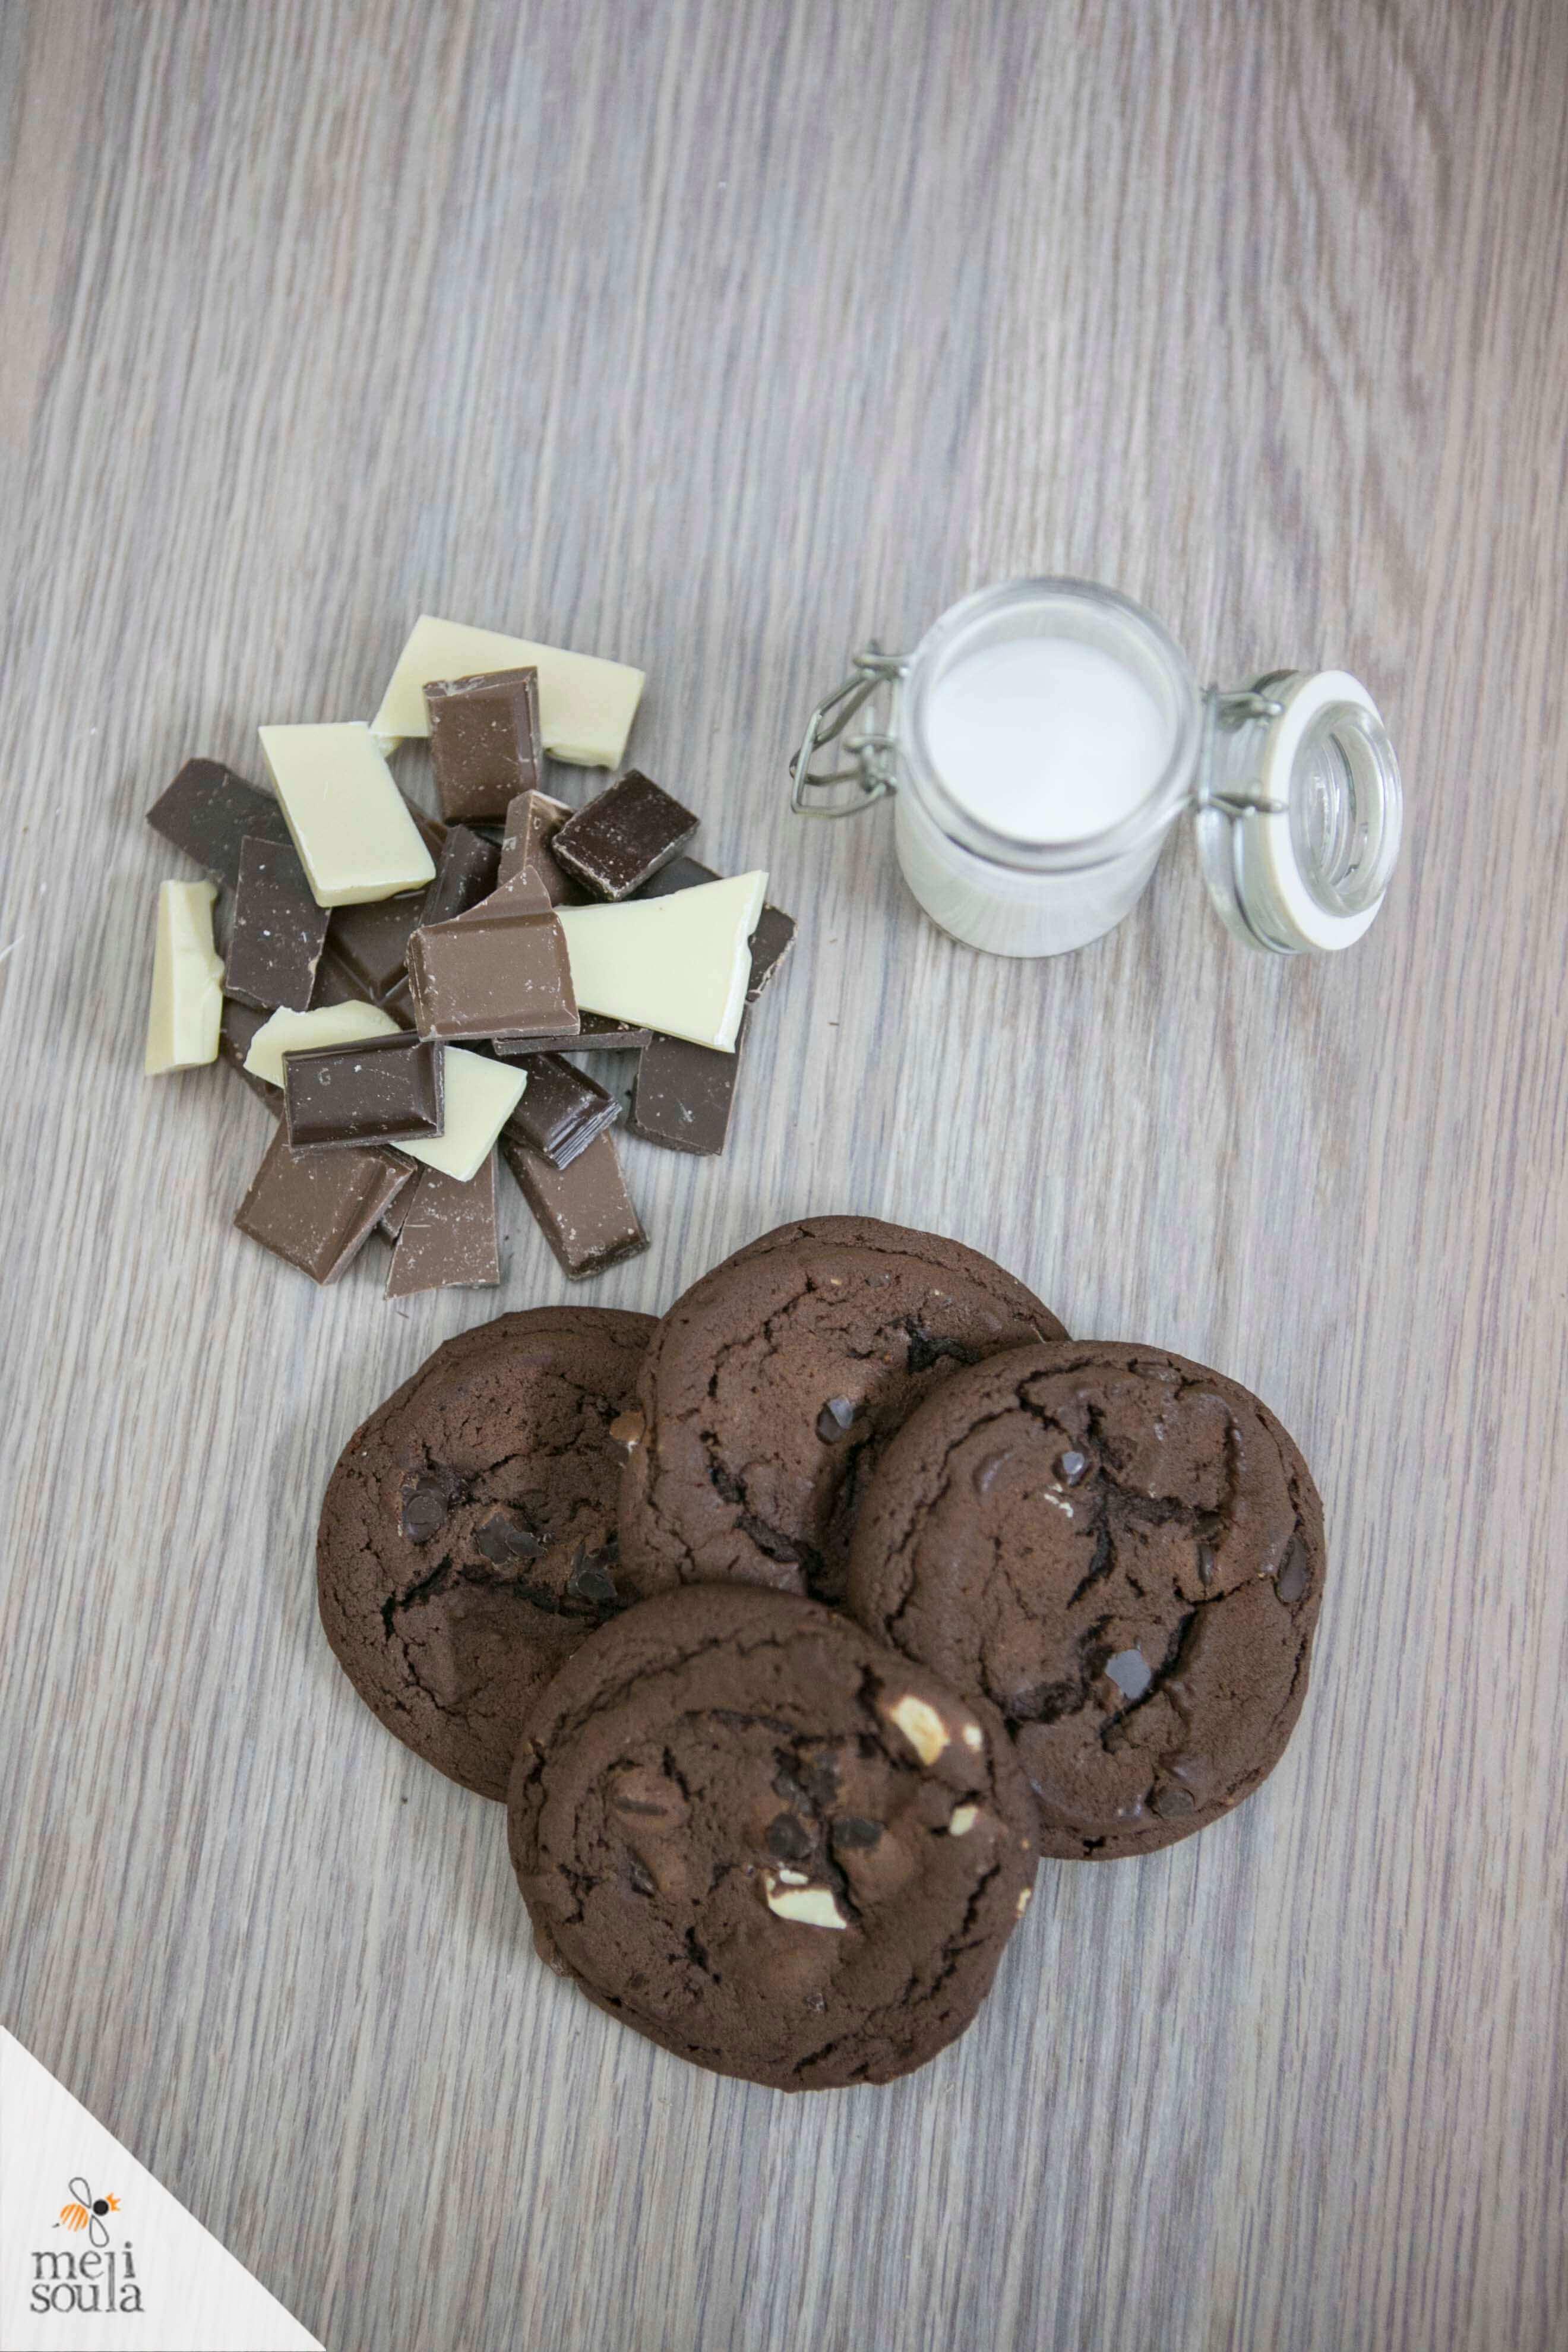 soft cookies me treis sokolaes